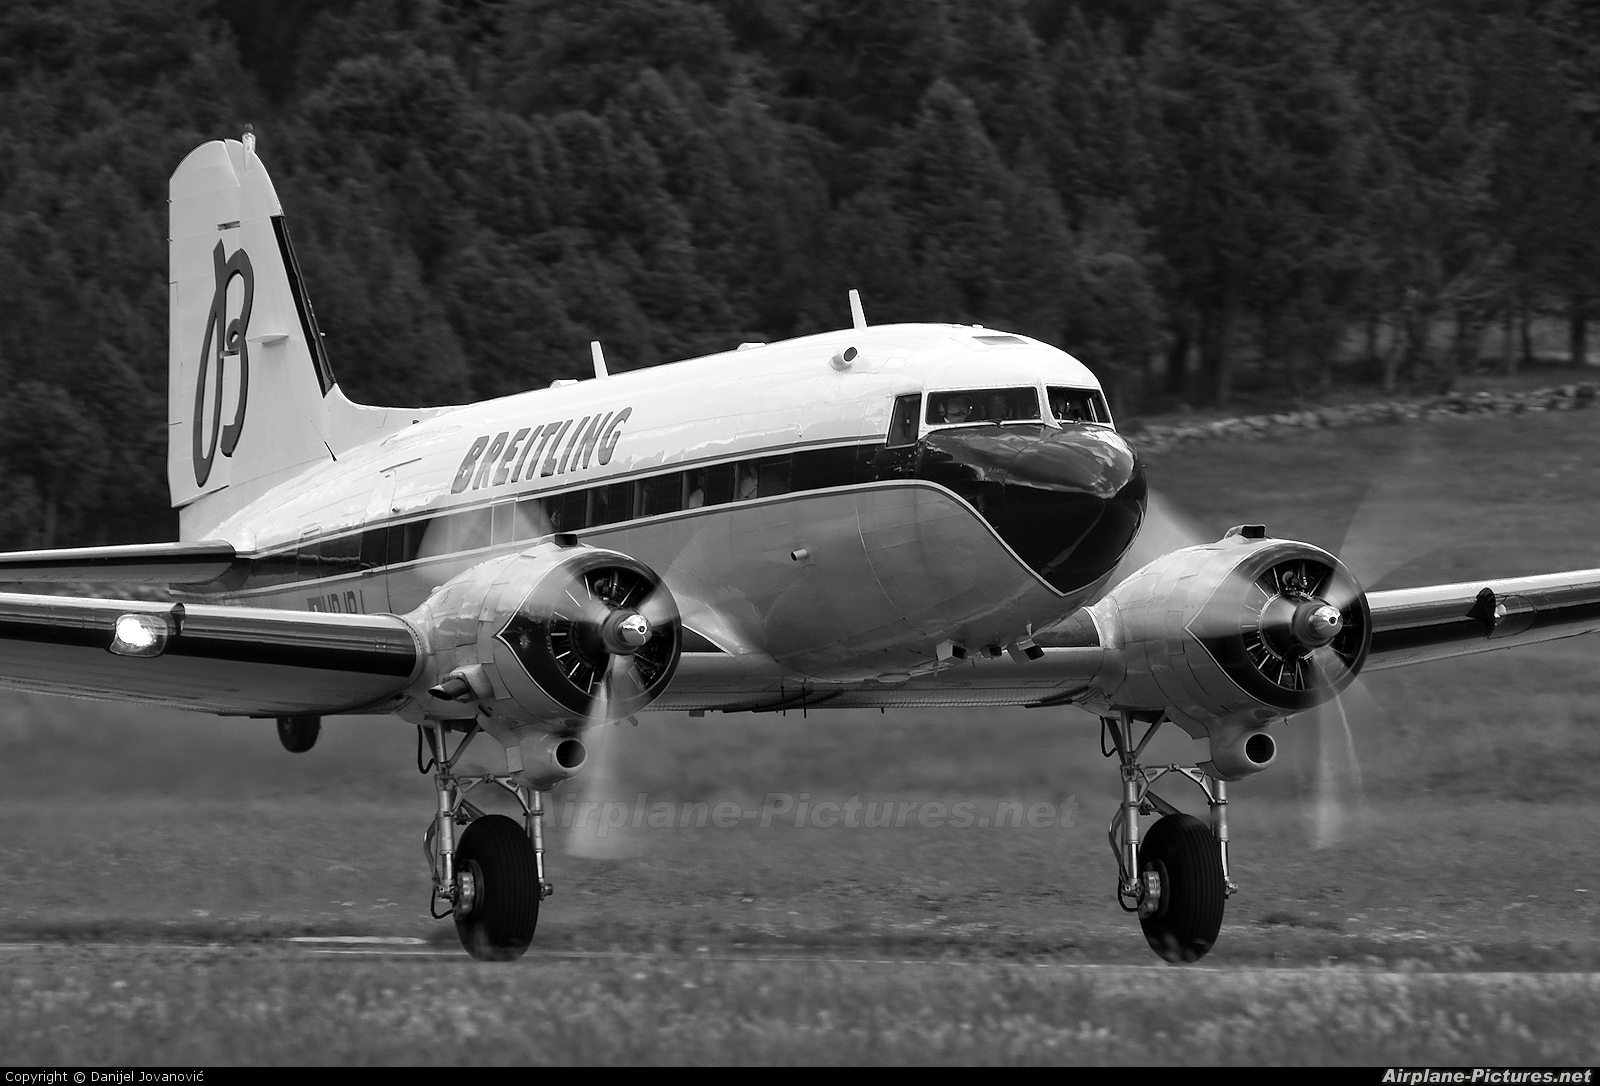 Super Constellation Flyers HB-IRJ aircraft at Samedan - Engadin